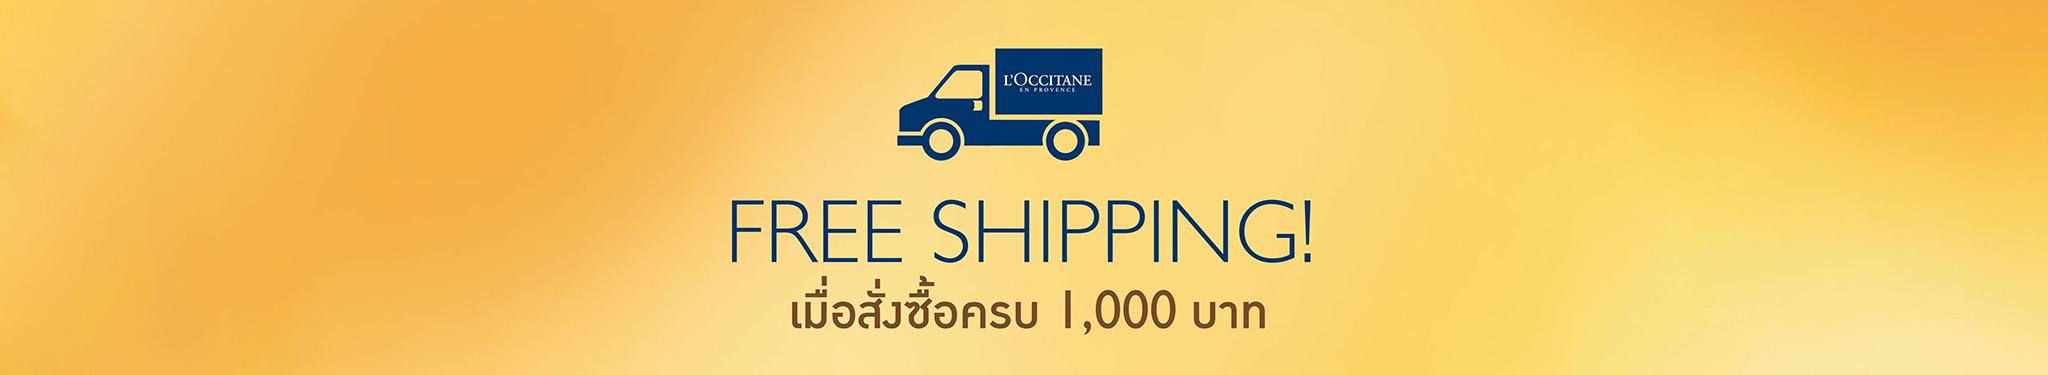 EC Free Shipping